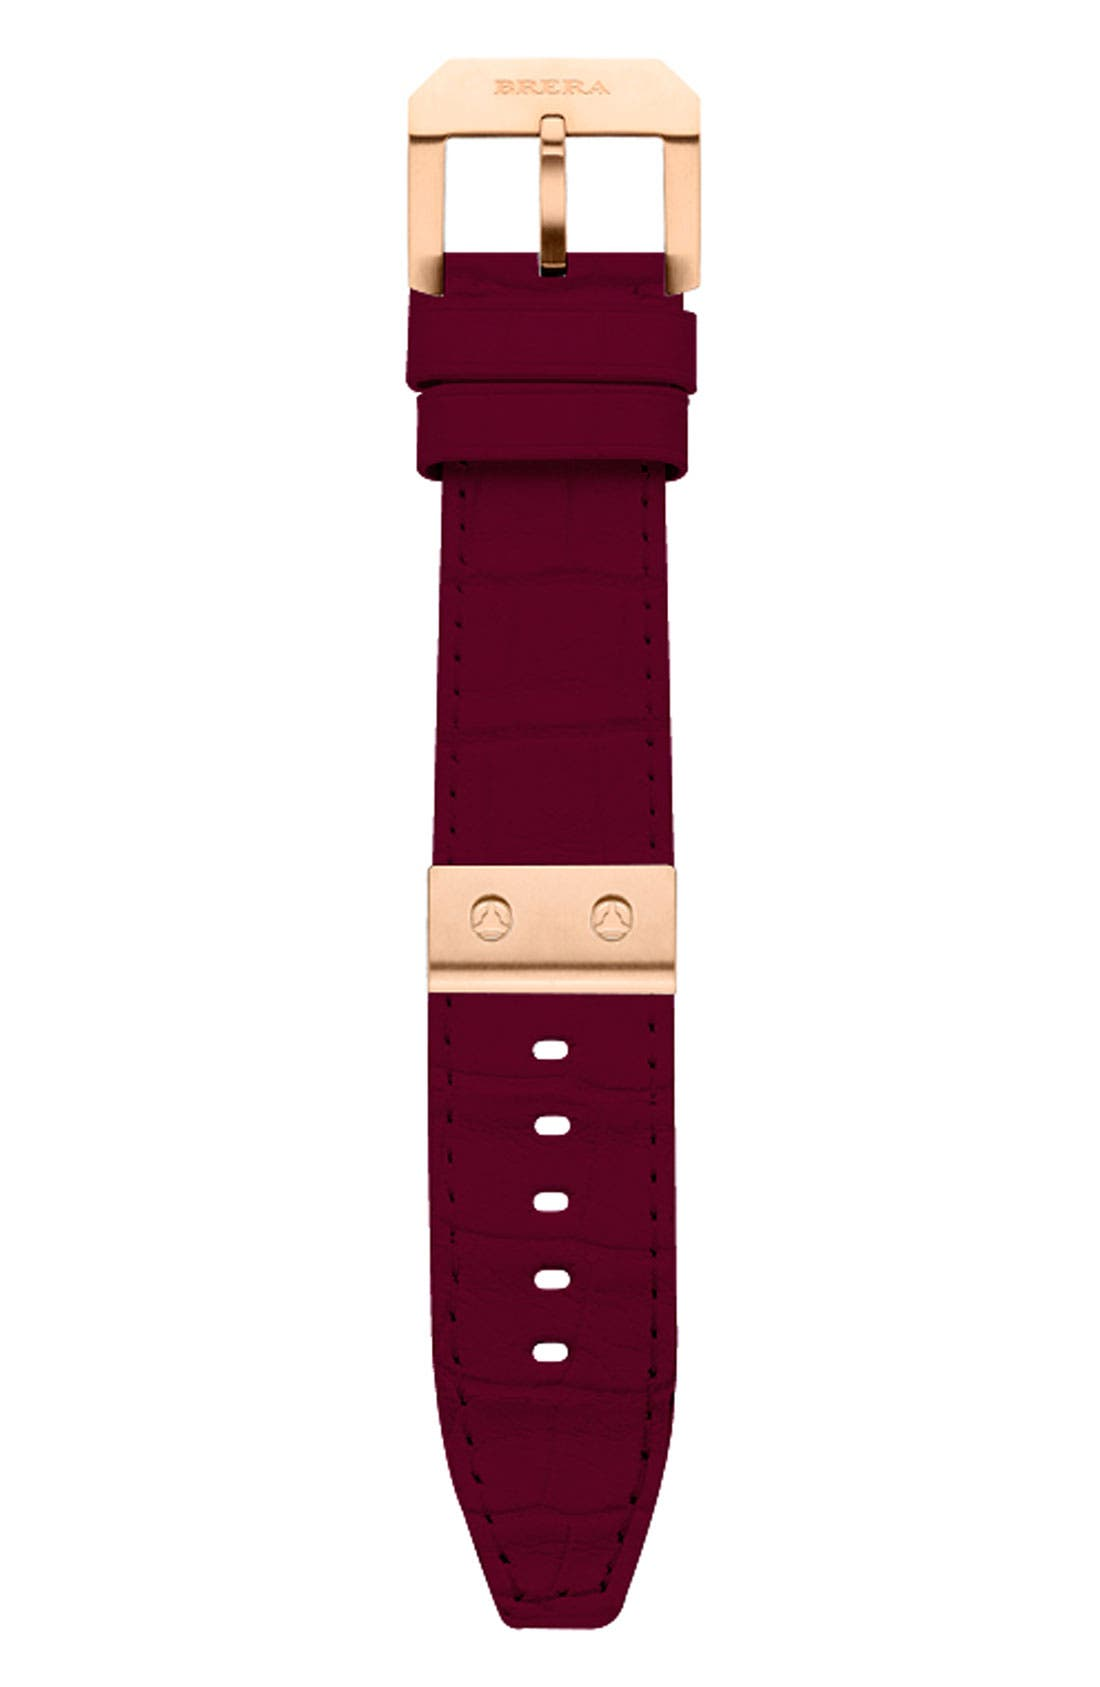 Main Image - Brera Orologi 22mm Alligator Watch Strap